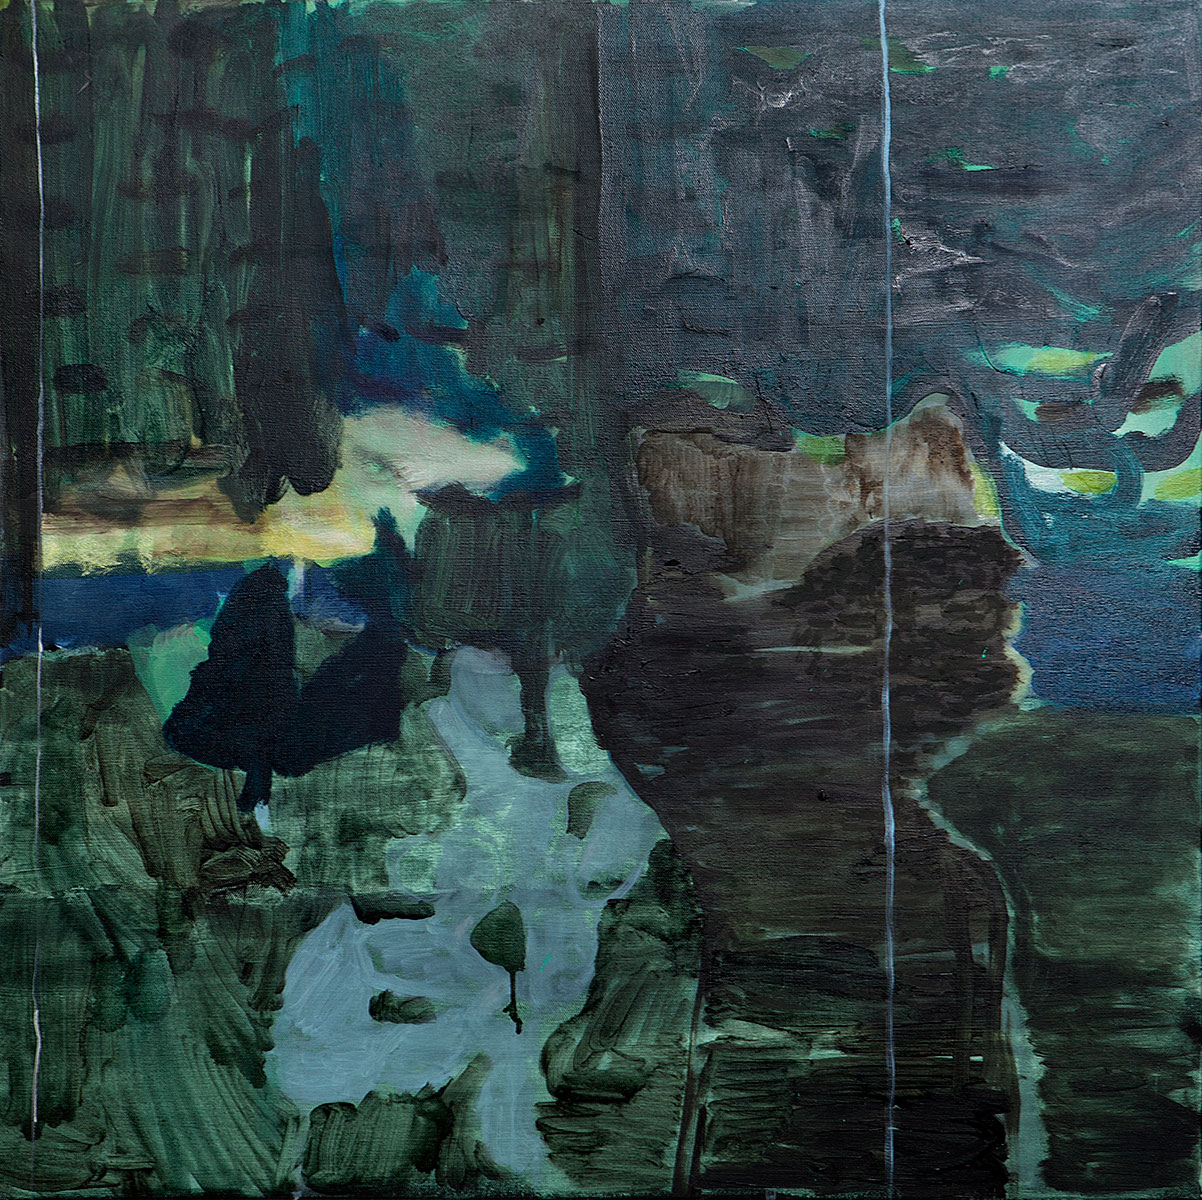 Glass Cabin | oil on canvas | 80 x 80cm | 2014